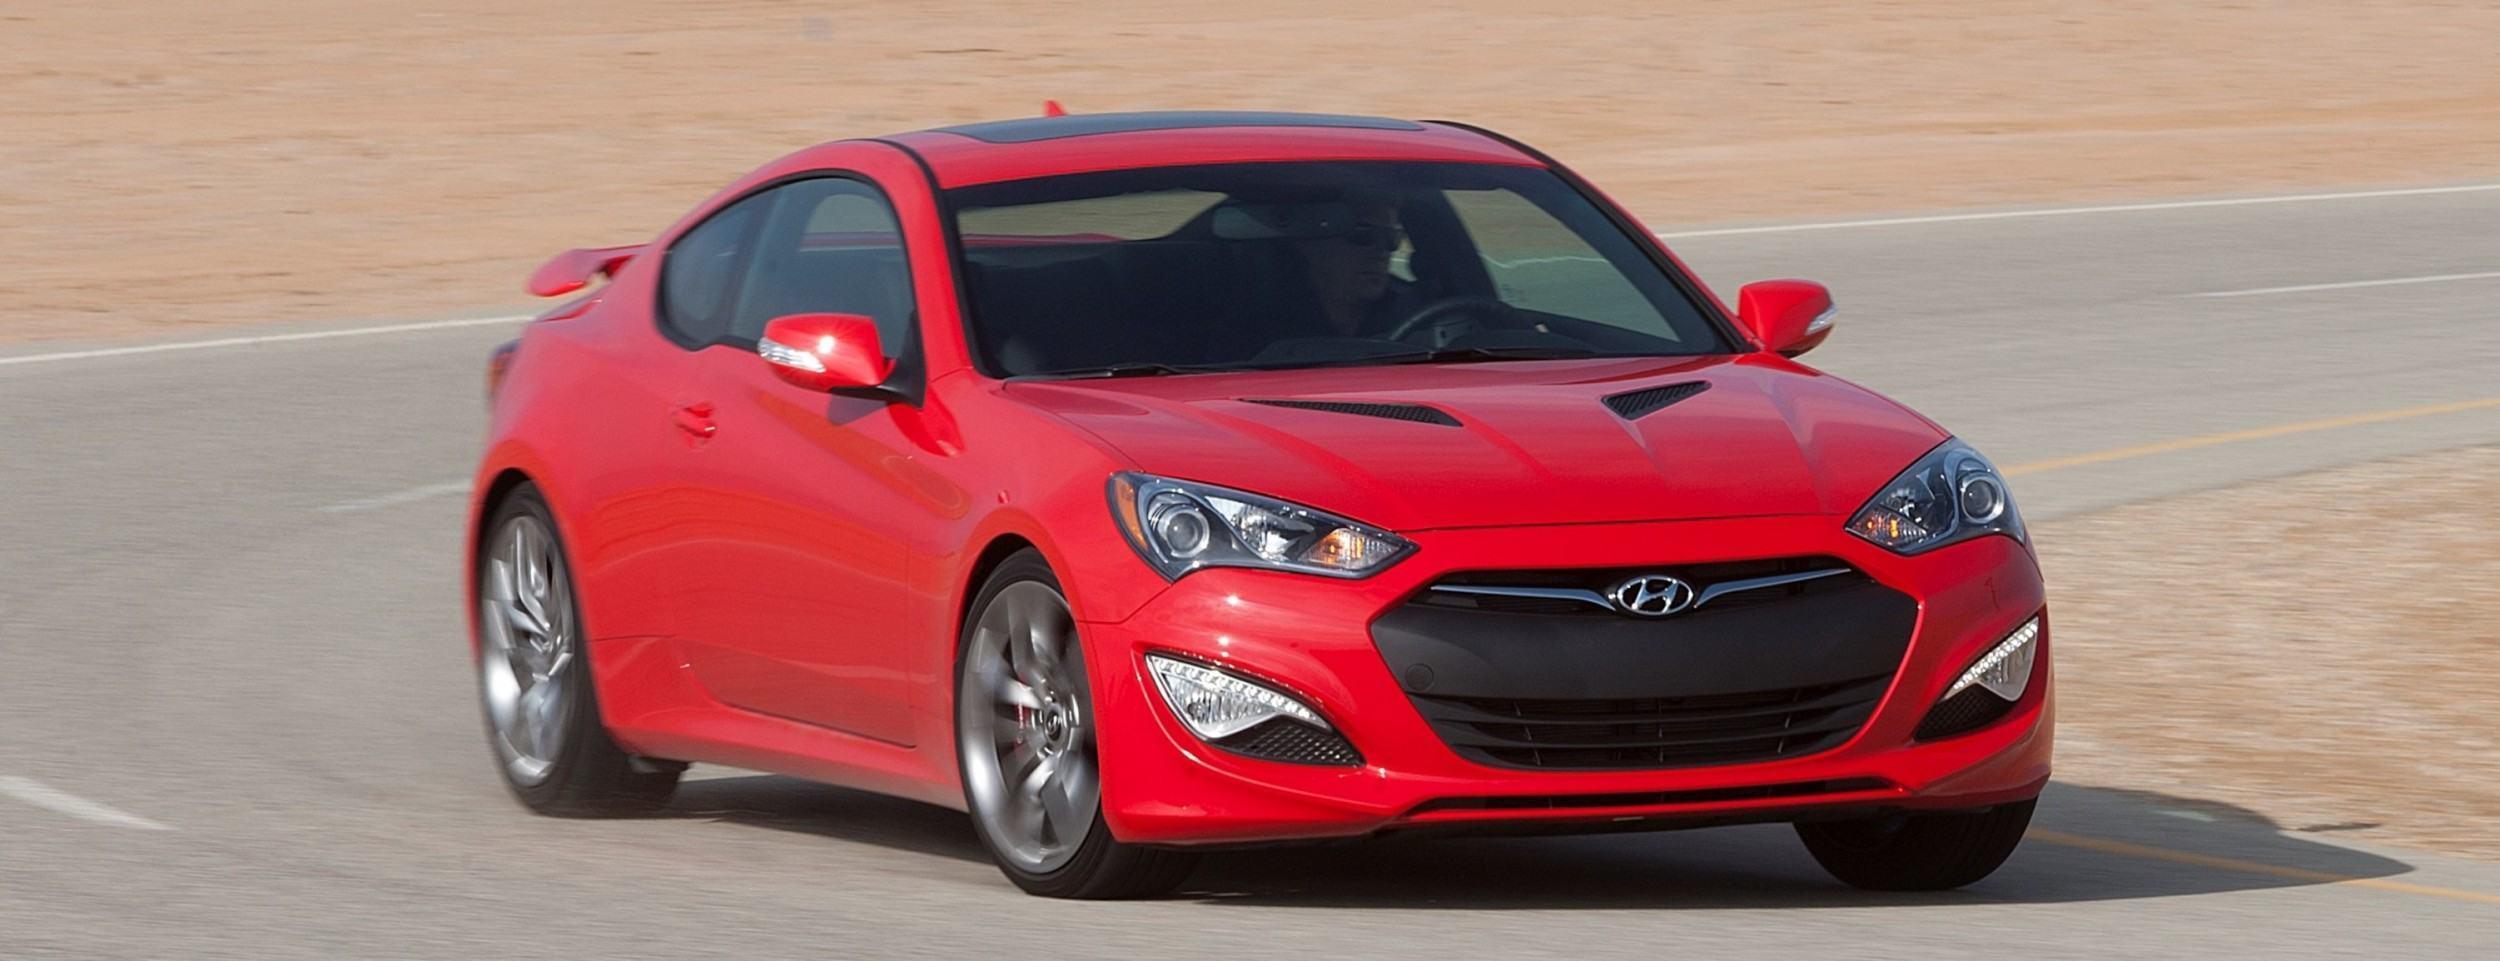 2014 hyundai genesis coupe 38l rspec road test review